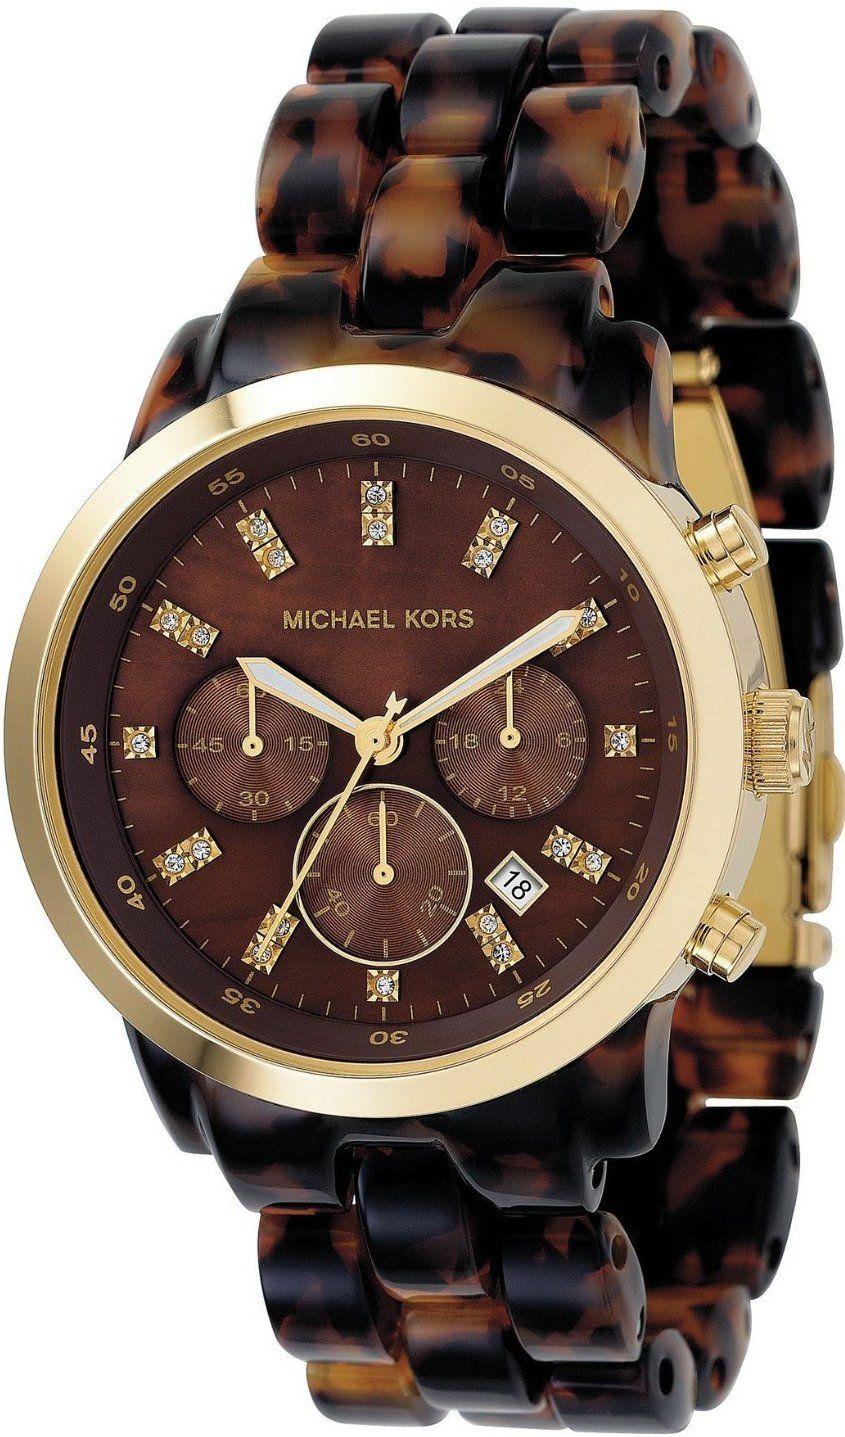 Michael Kors Watch , Michael Kors Women's MK5216 Chronograph Tortoise Watch...$160.65